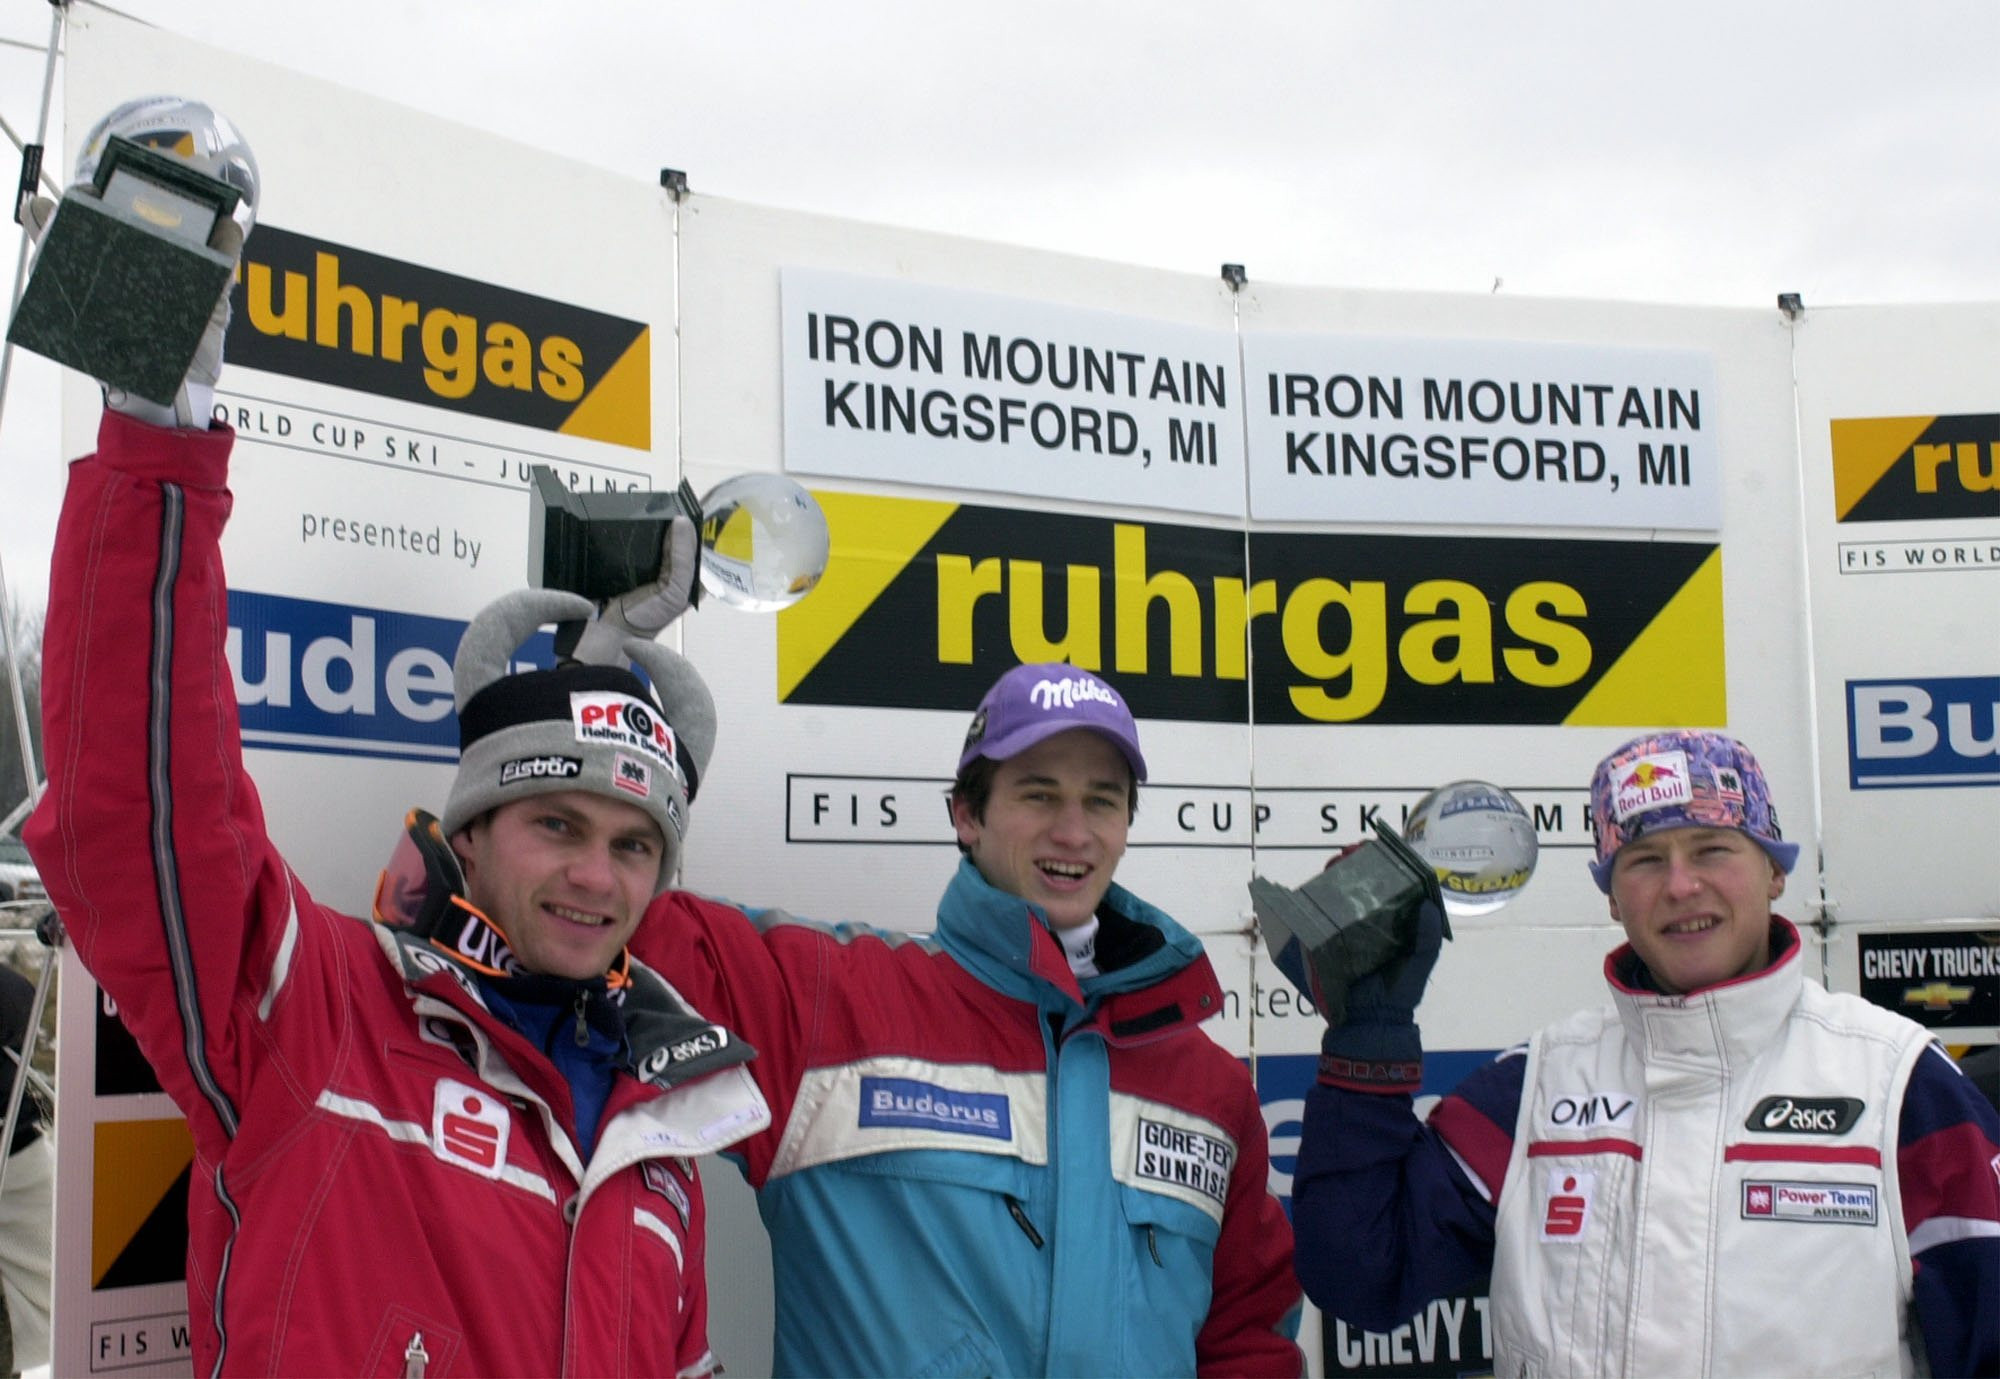 Michigan to host leg of 2021 FIS Ski Jumping World Cup